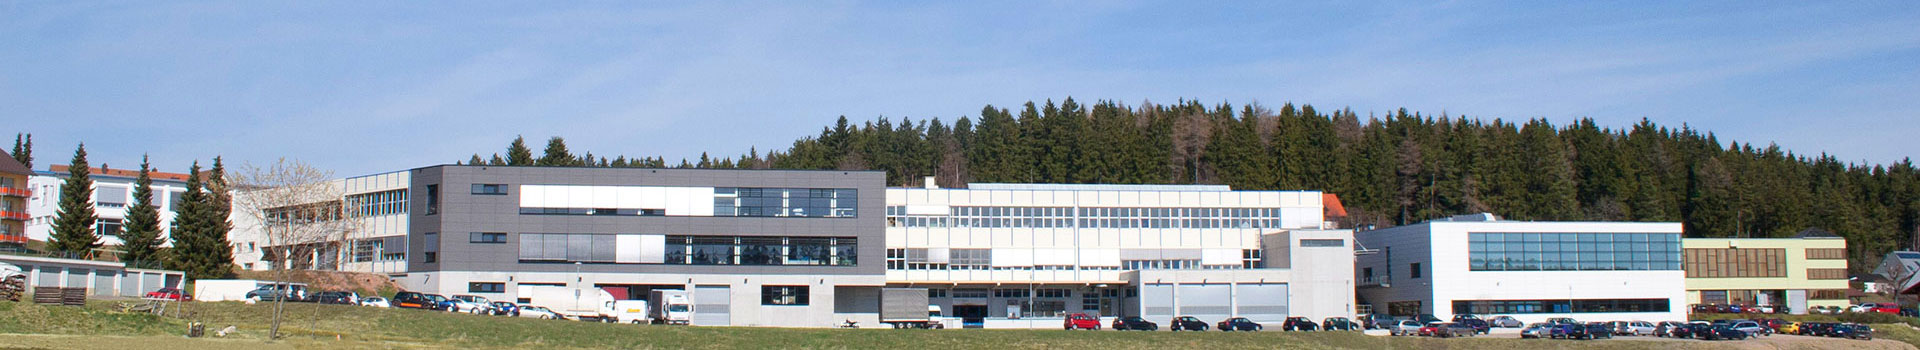 Franz Morat Group Eisenbach